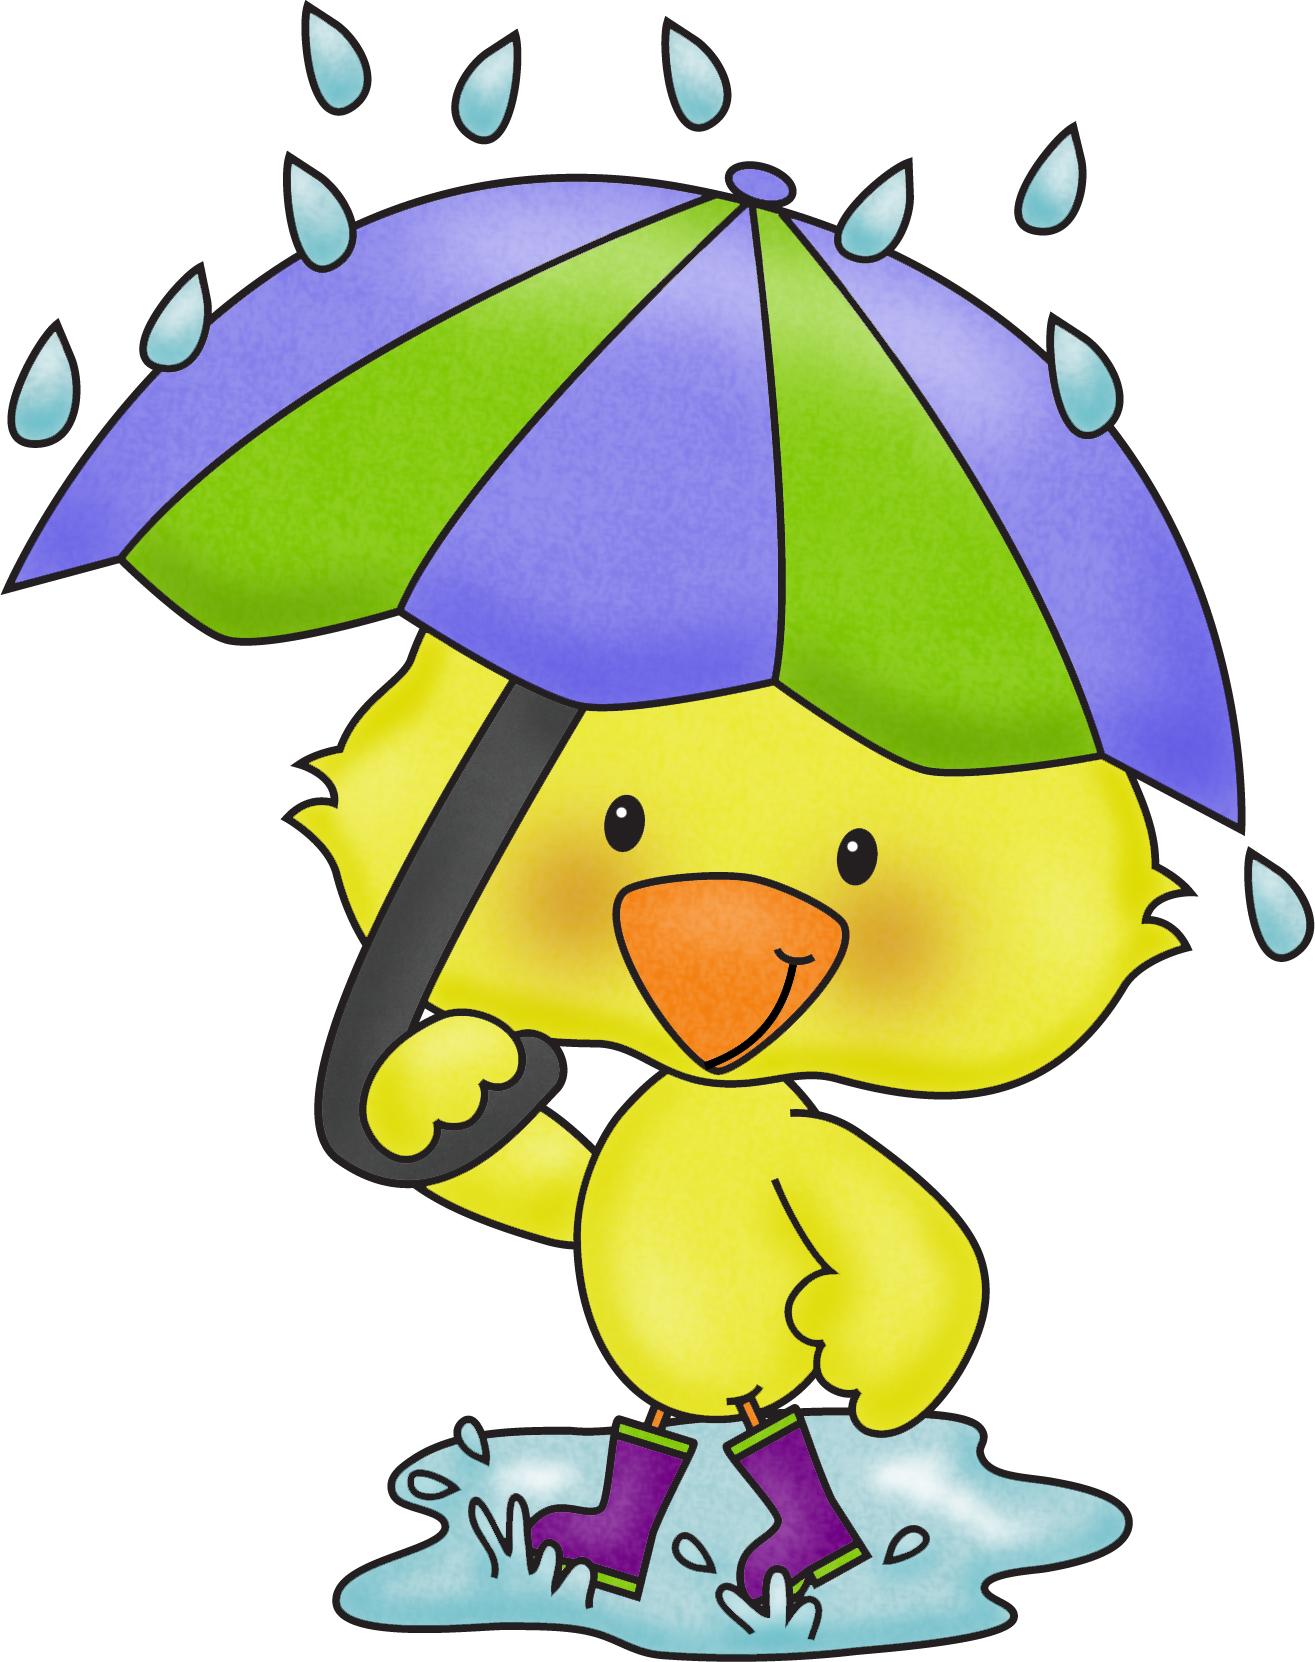 Showers clip art library. April clipart printable